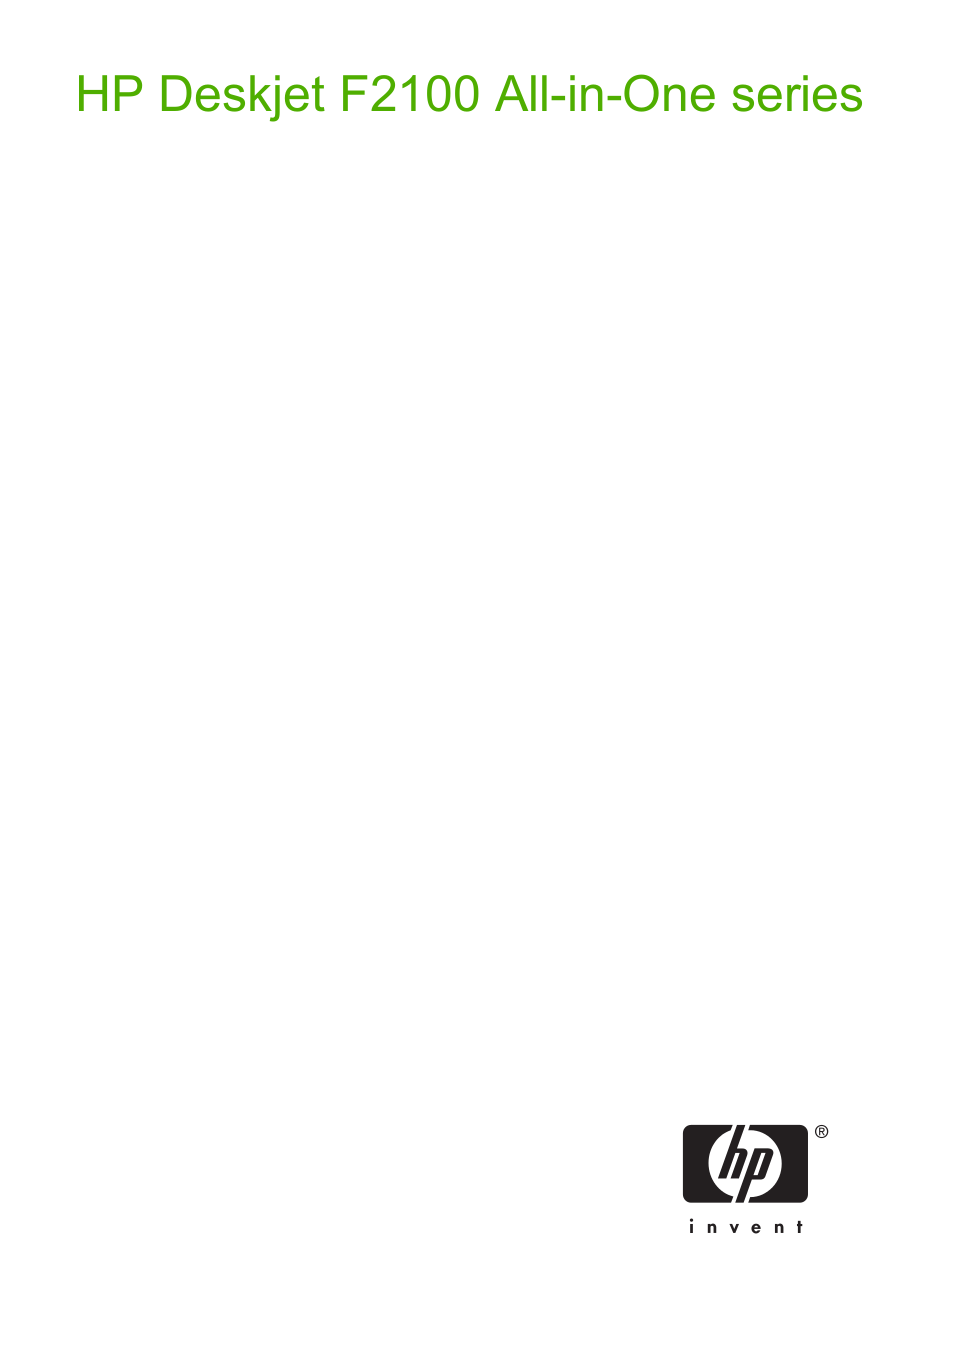 pdf for HP Multifunction Printer Deskjet F2180 manual